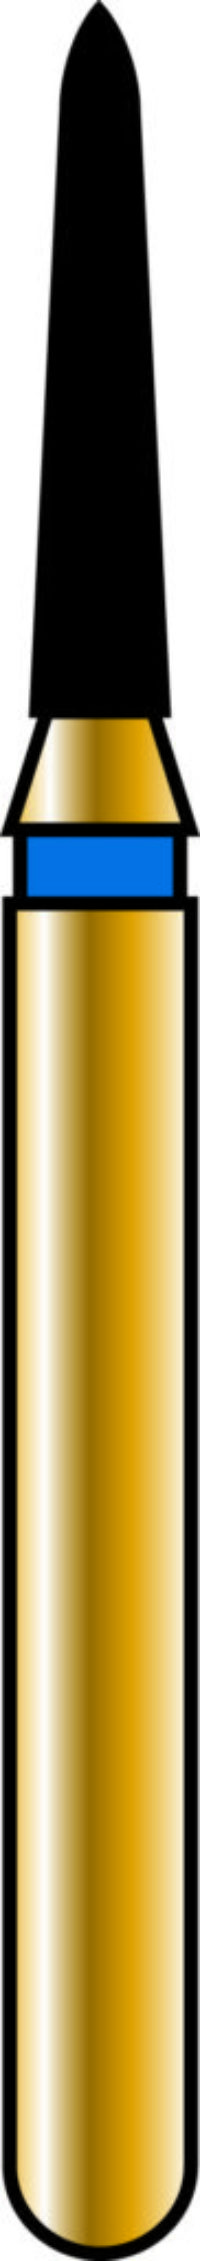 Pointed Taper 12-6mm Gold Diamond Bur